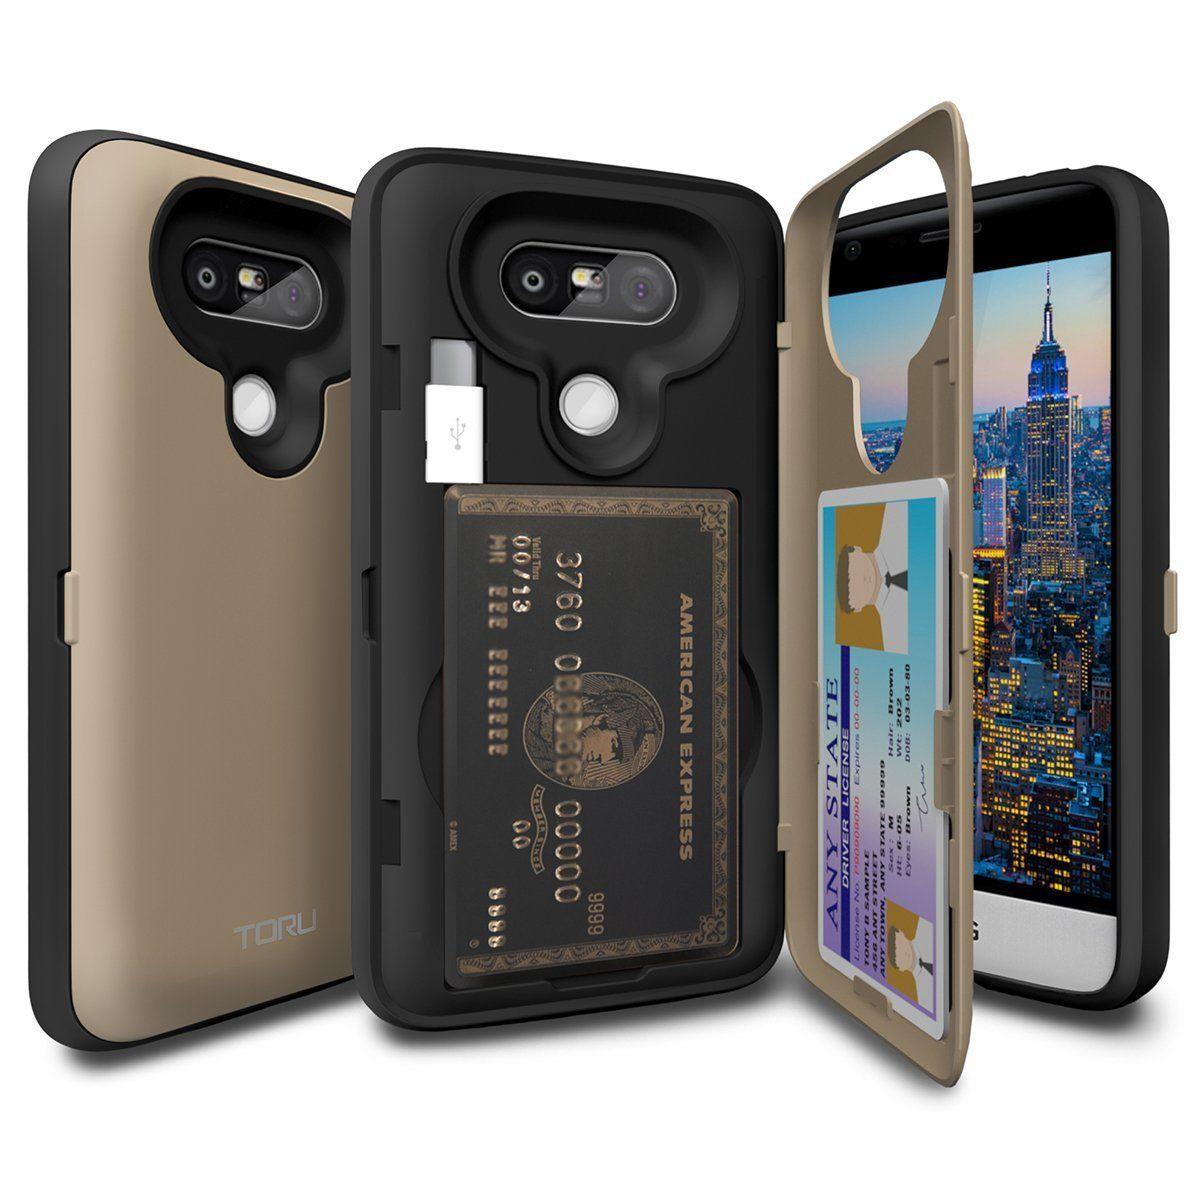 Amazon.com: LG G5 Case, TORU [CX PRO] G5 Wallet Case